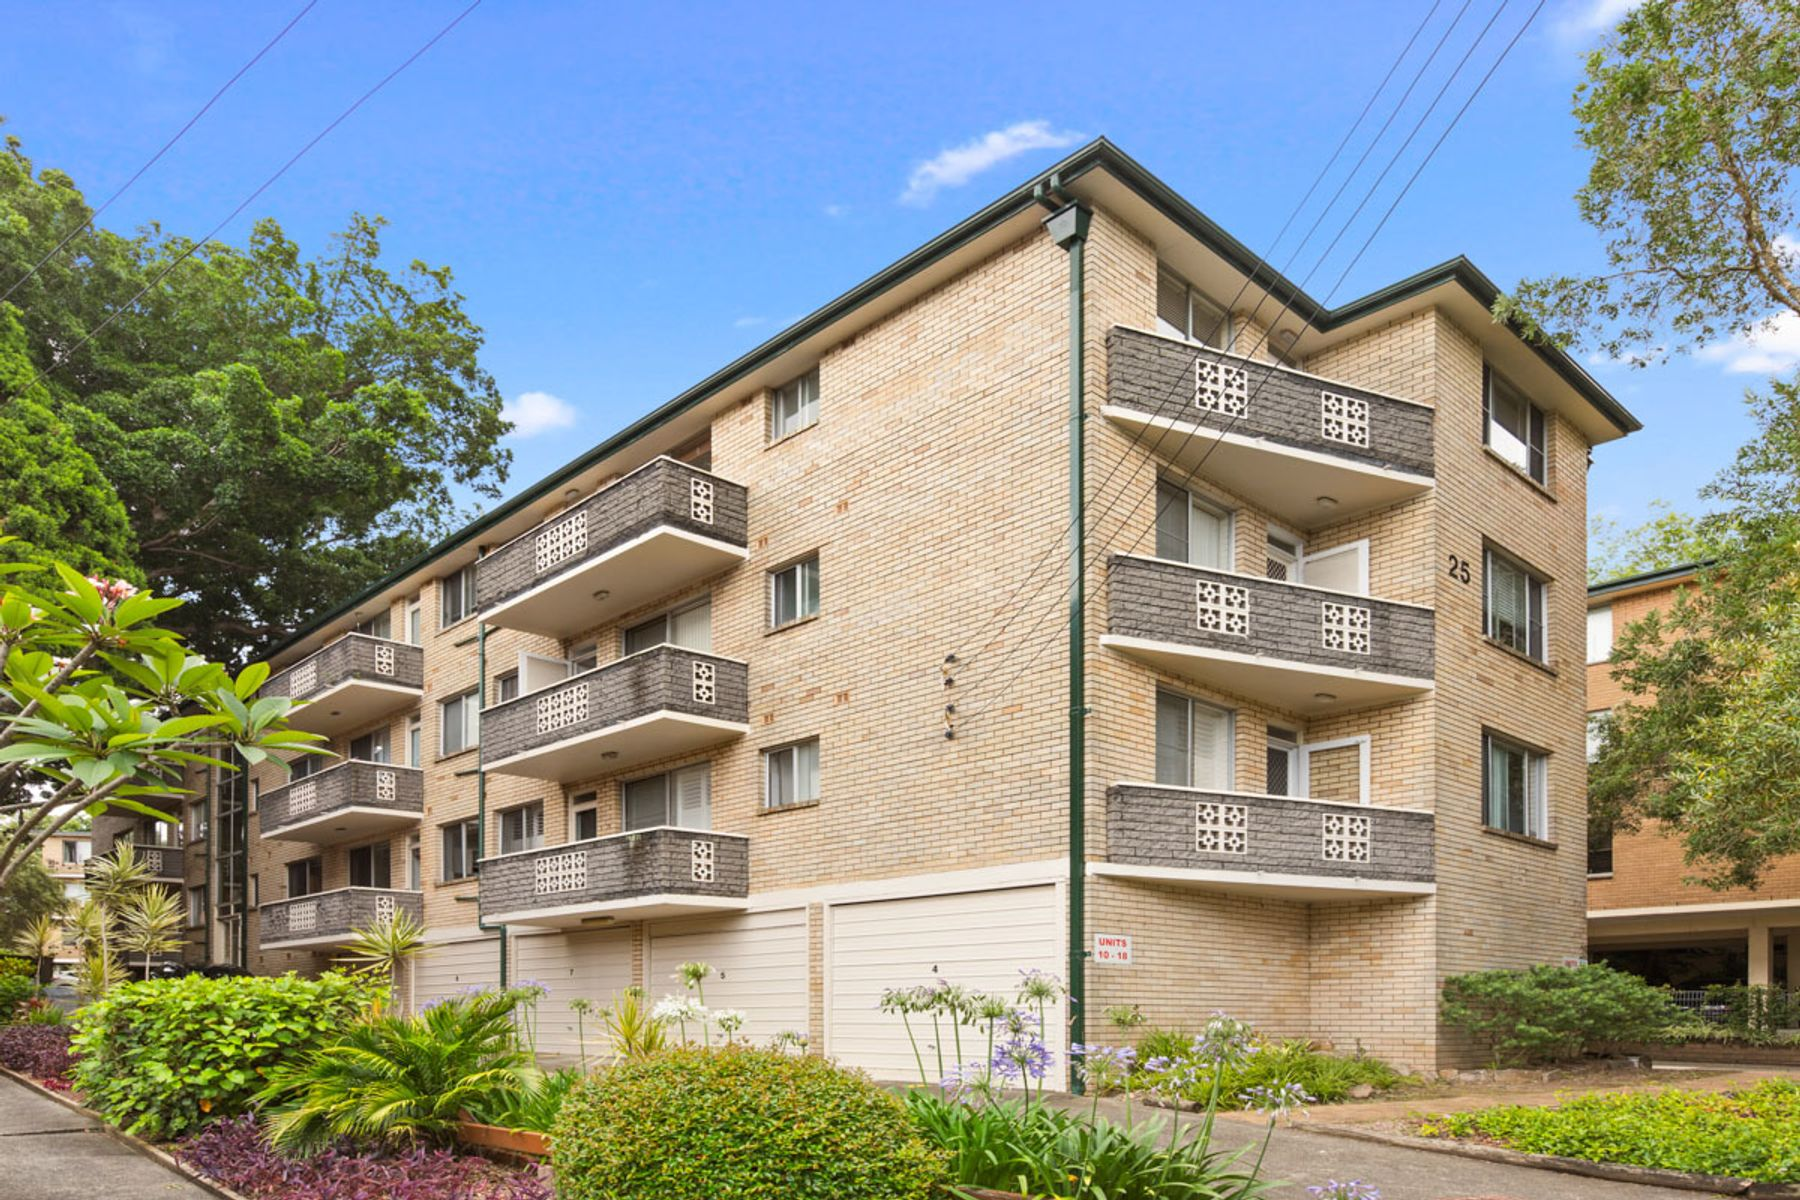 16/25 Wharf Road, Gladesville, NSW 2111